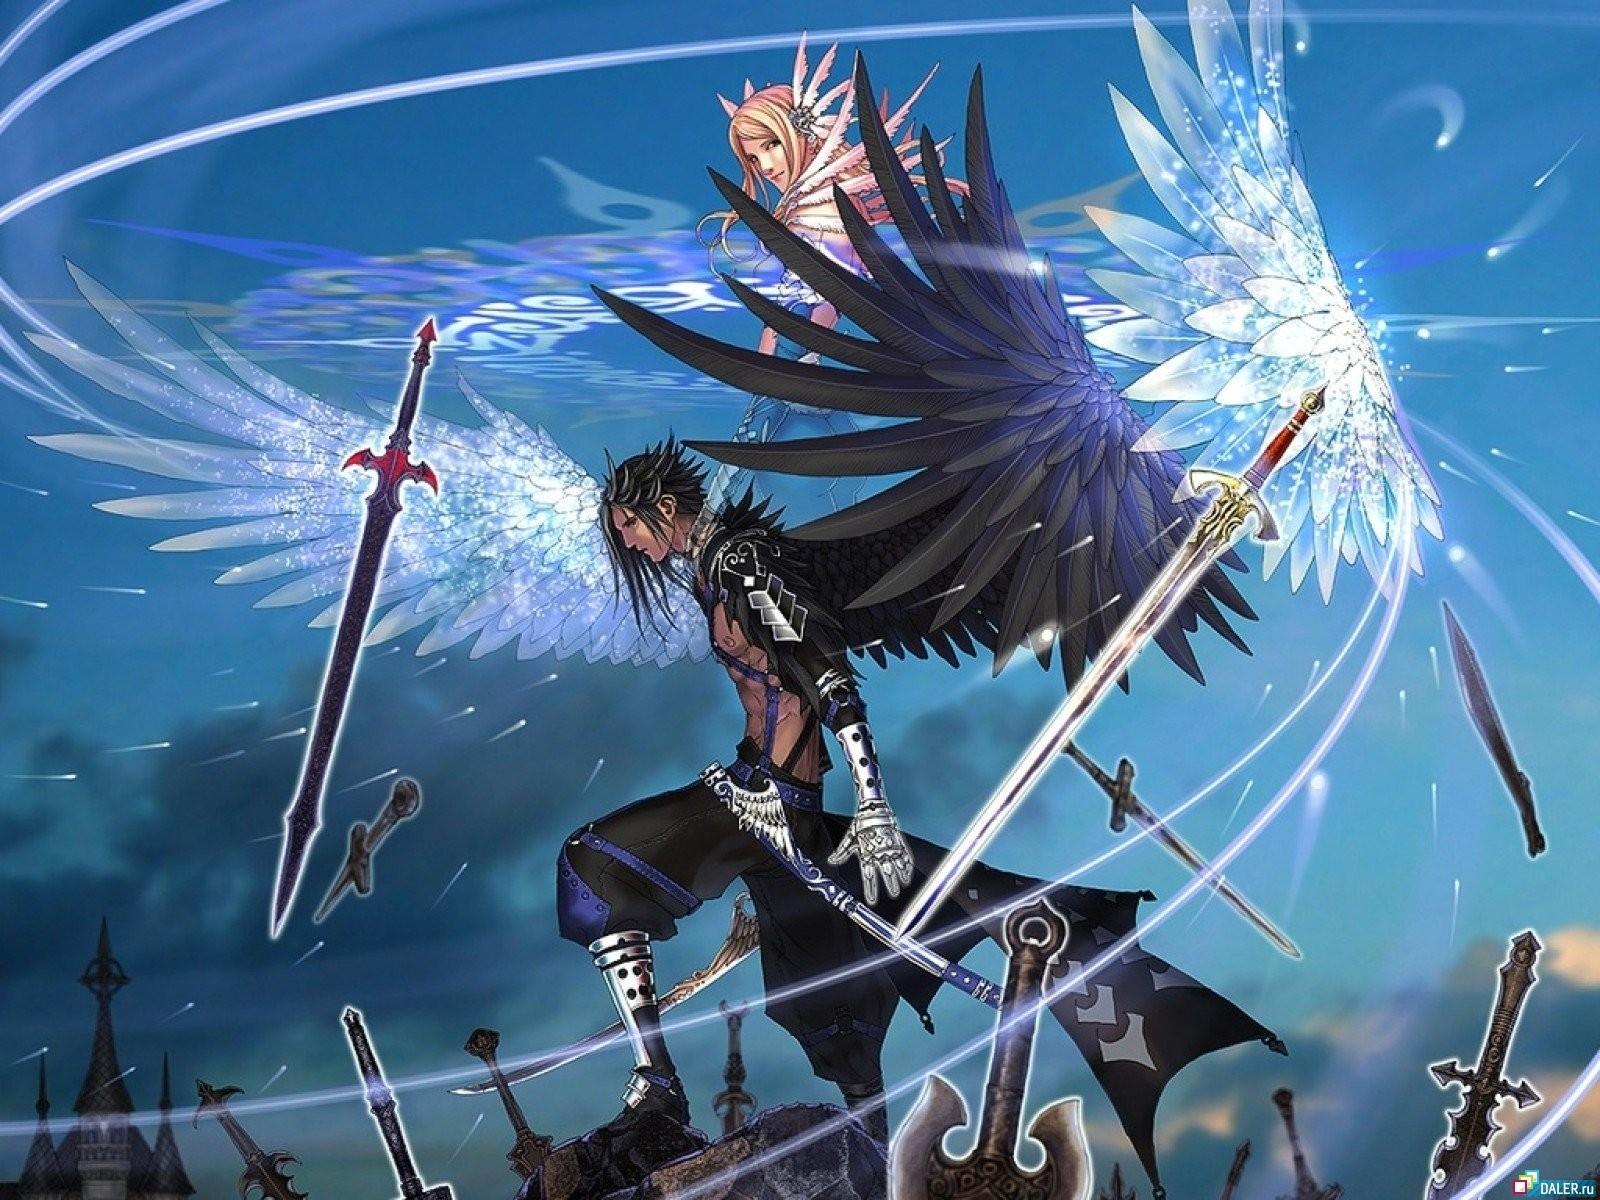 Anime Wings Flying Boy Girl Performance Jump Screenshot Computer Wallpaper Swords